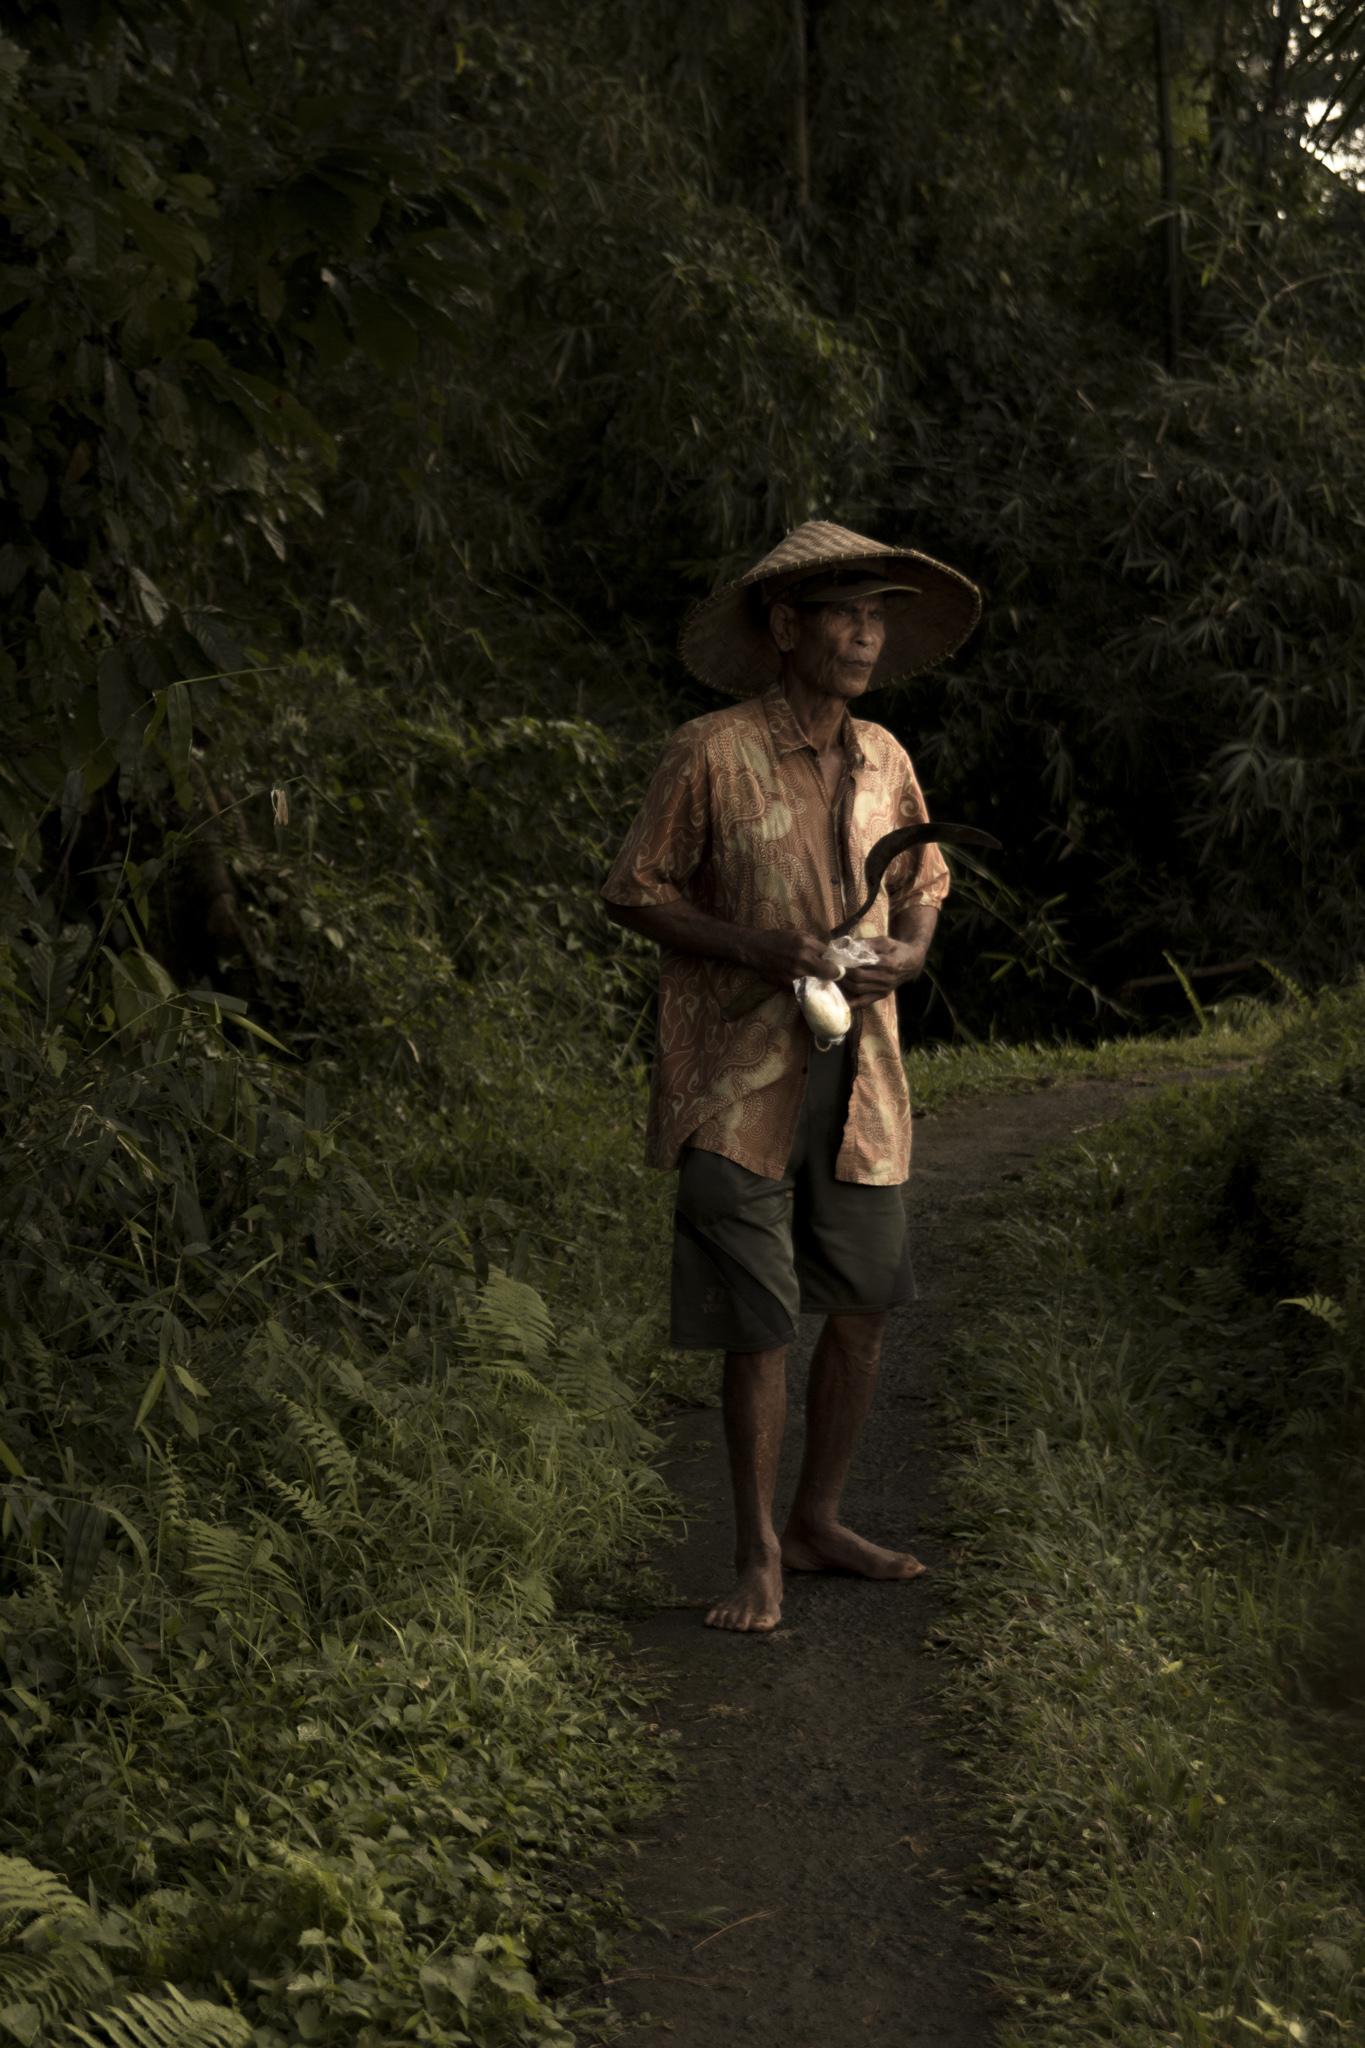 Farmer, Jegu Penebel, Bali, Tabanan